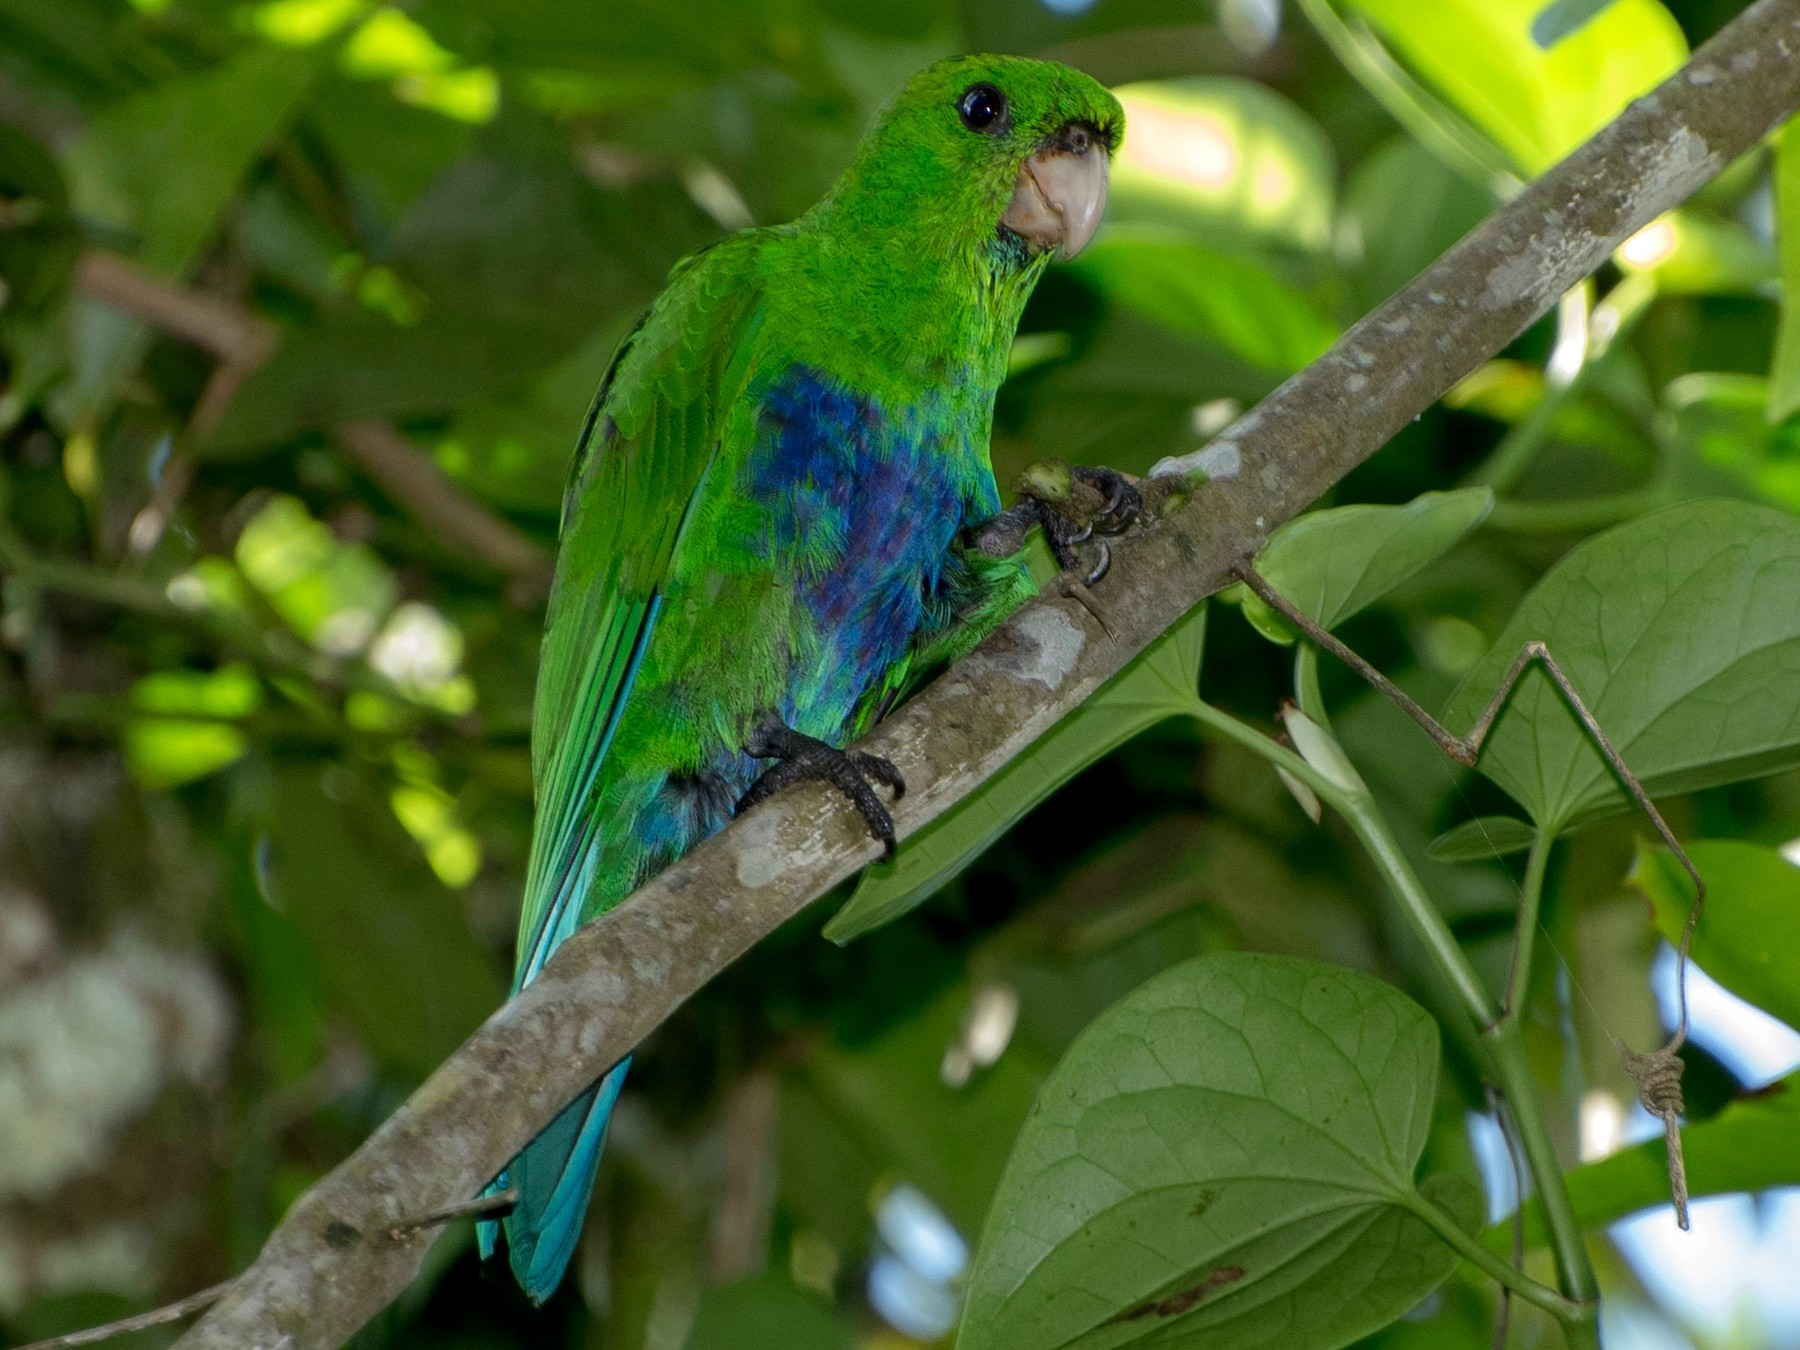 Blue-bellied Parrot - Luiz Carlos Ramassotti